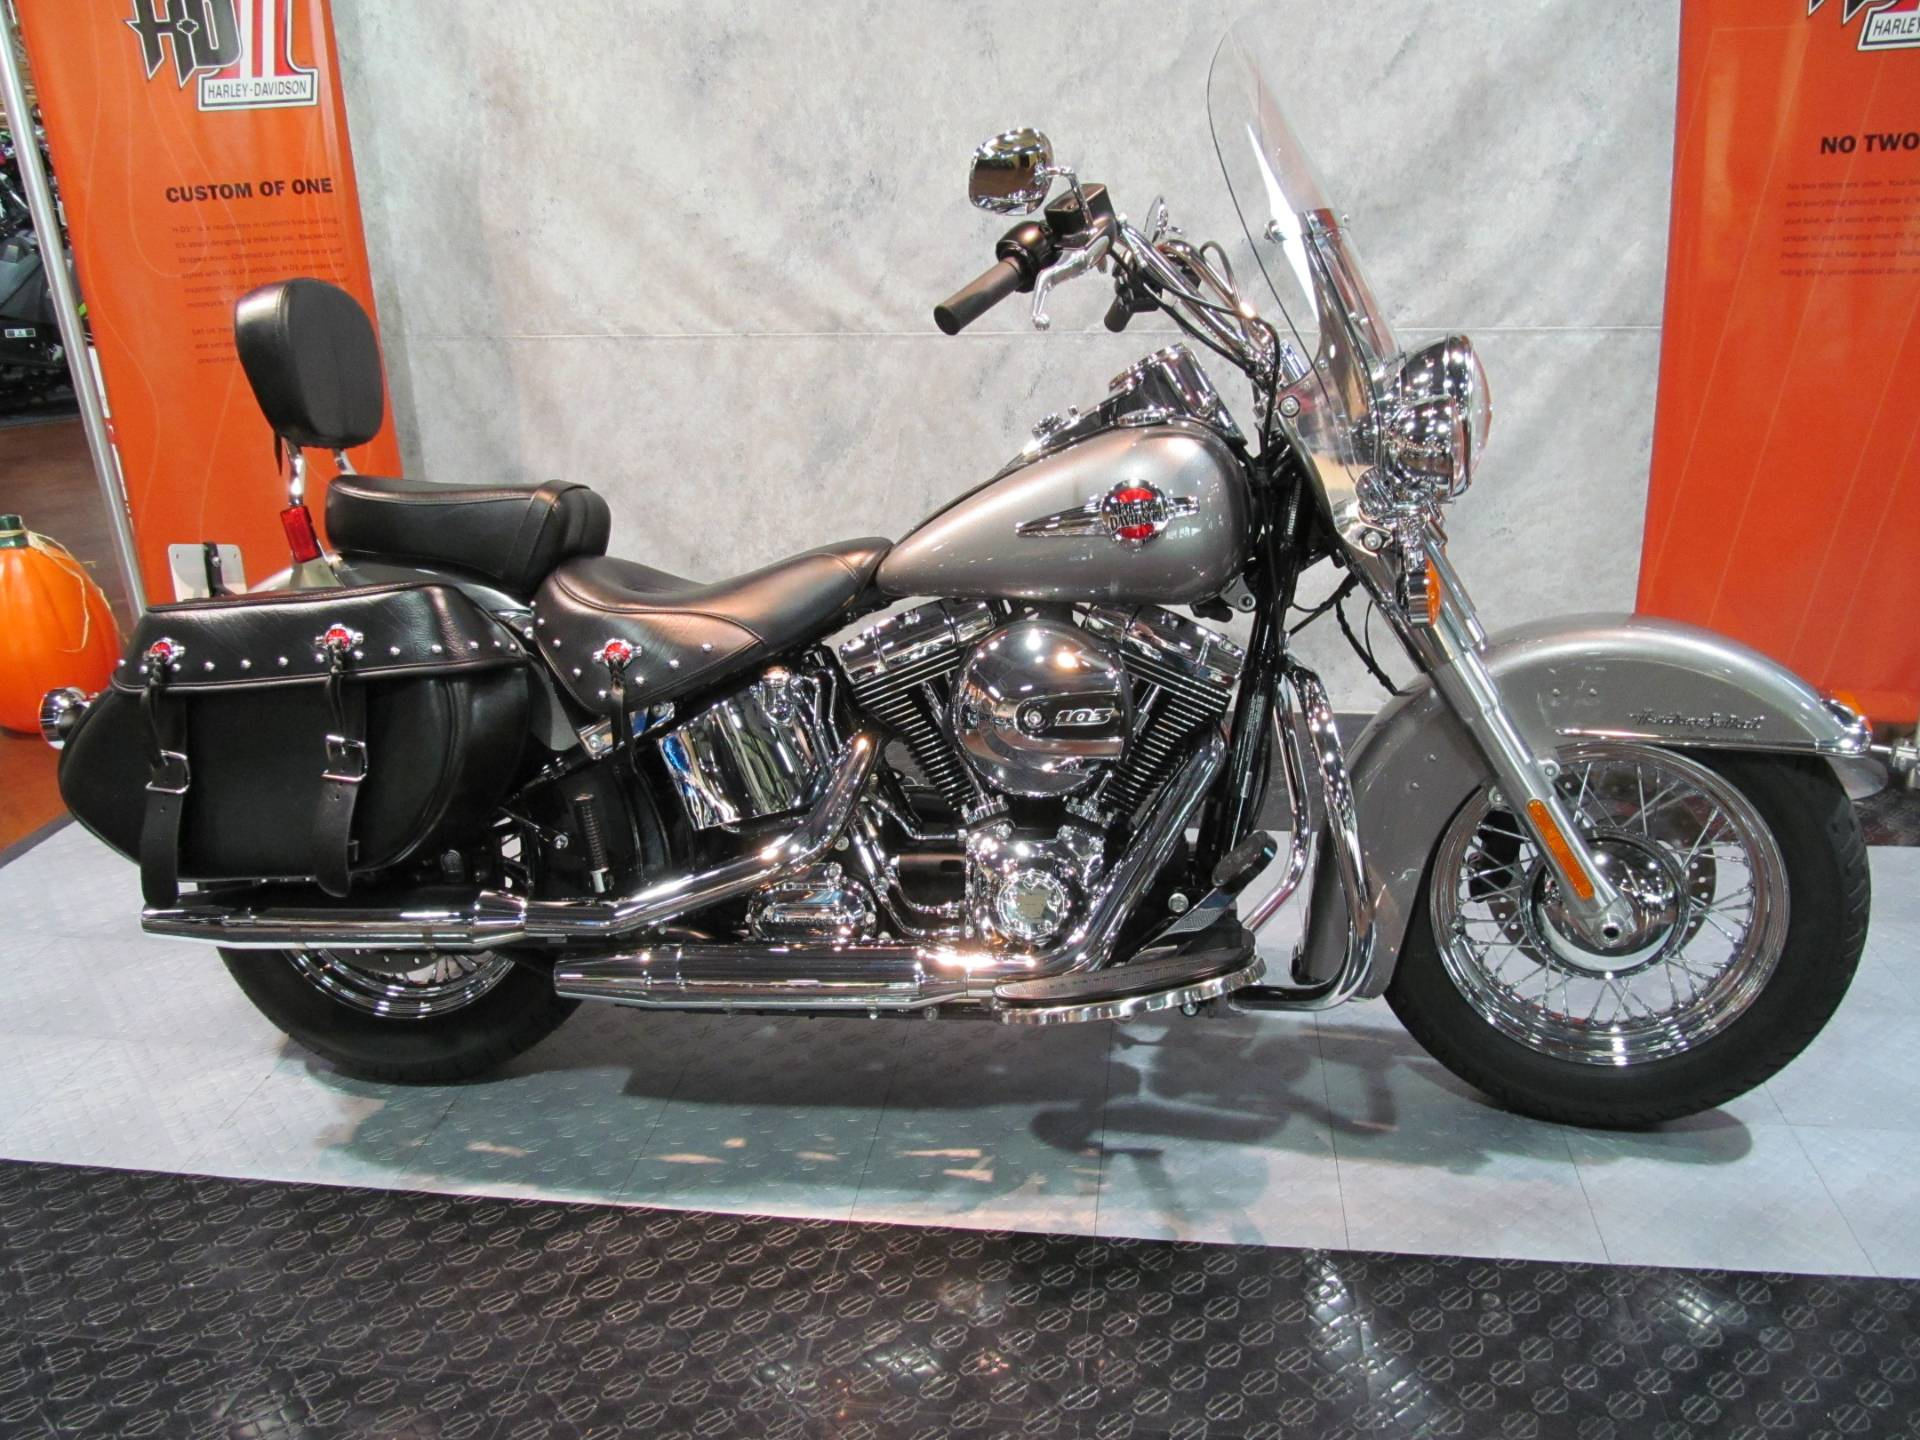 2016 Harley-Davidson Heritage Softail Classic in Rothschild, Wisconsin